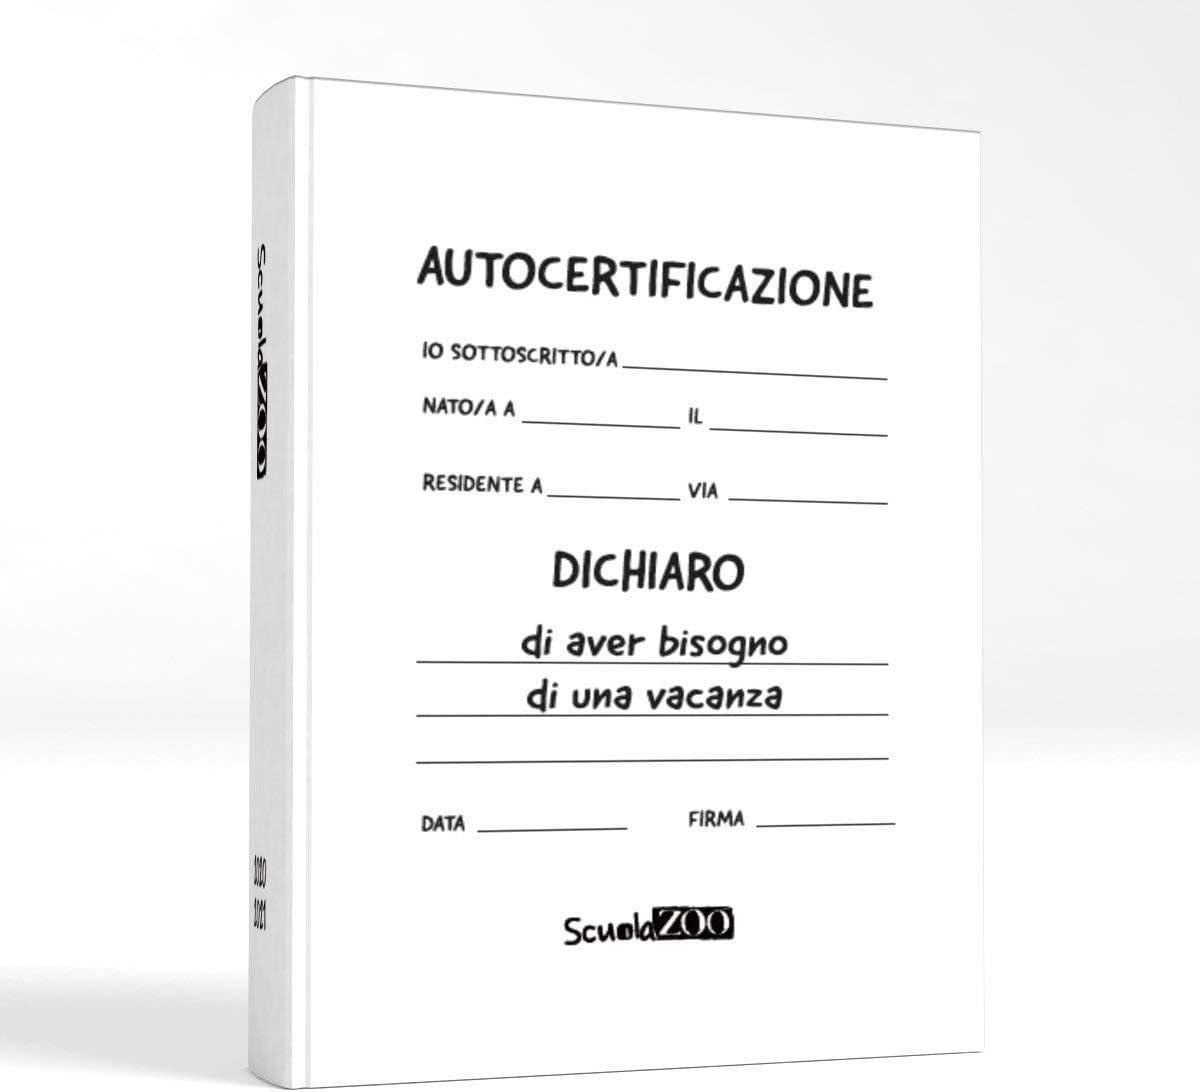 Oro Scuolazoo Diario Special Edition Limited 16 mesi 2020-2021 11,5x15,5 cm